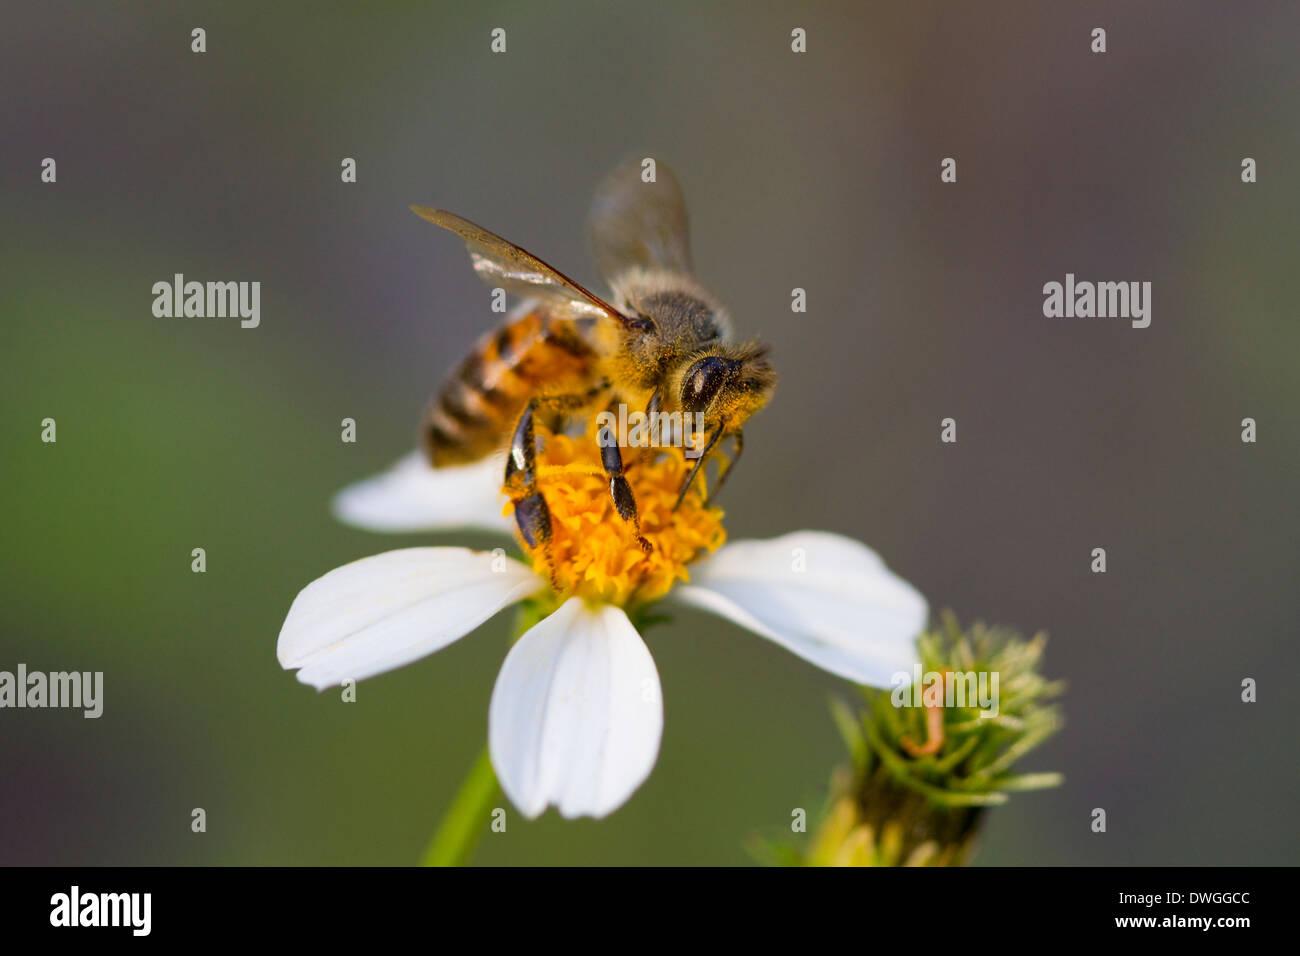 HONEYBEE (Apis mellifera) collecting pollen on Beggers Tick (Bidens alba), Fort Myers, Florida, USA. - Stock Image